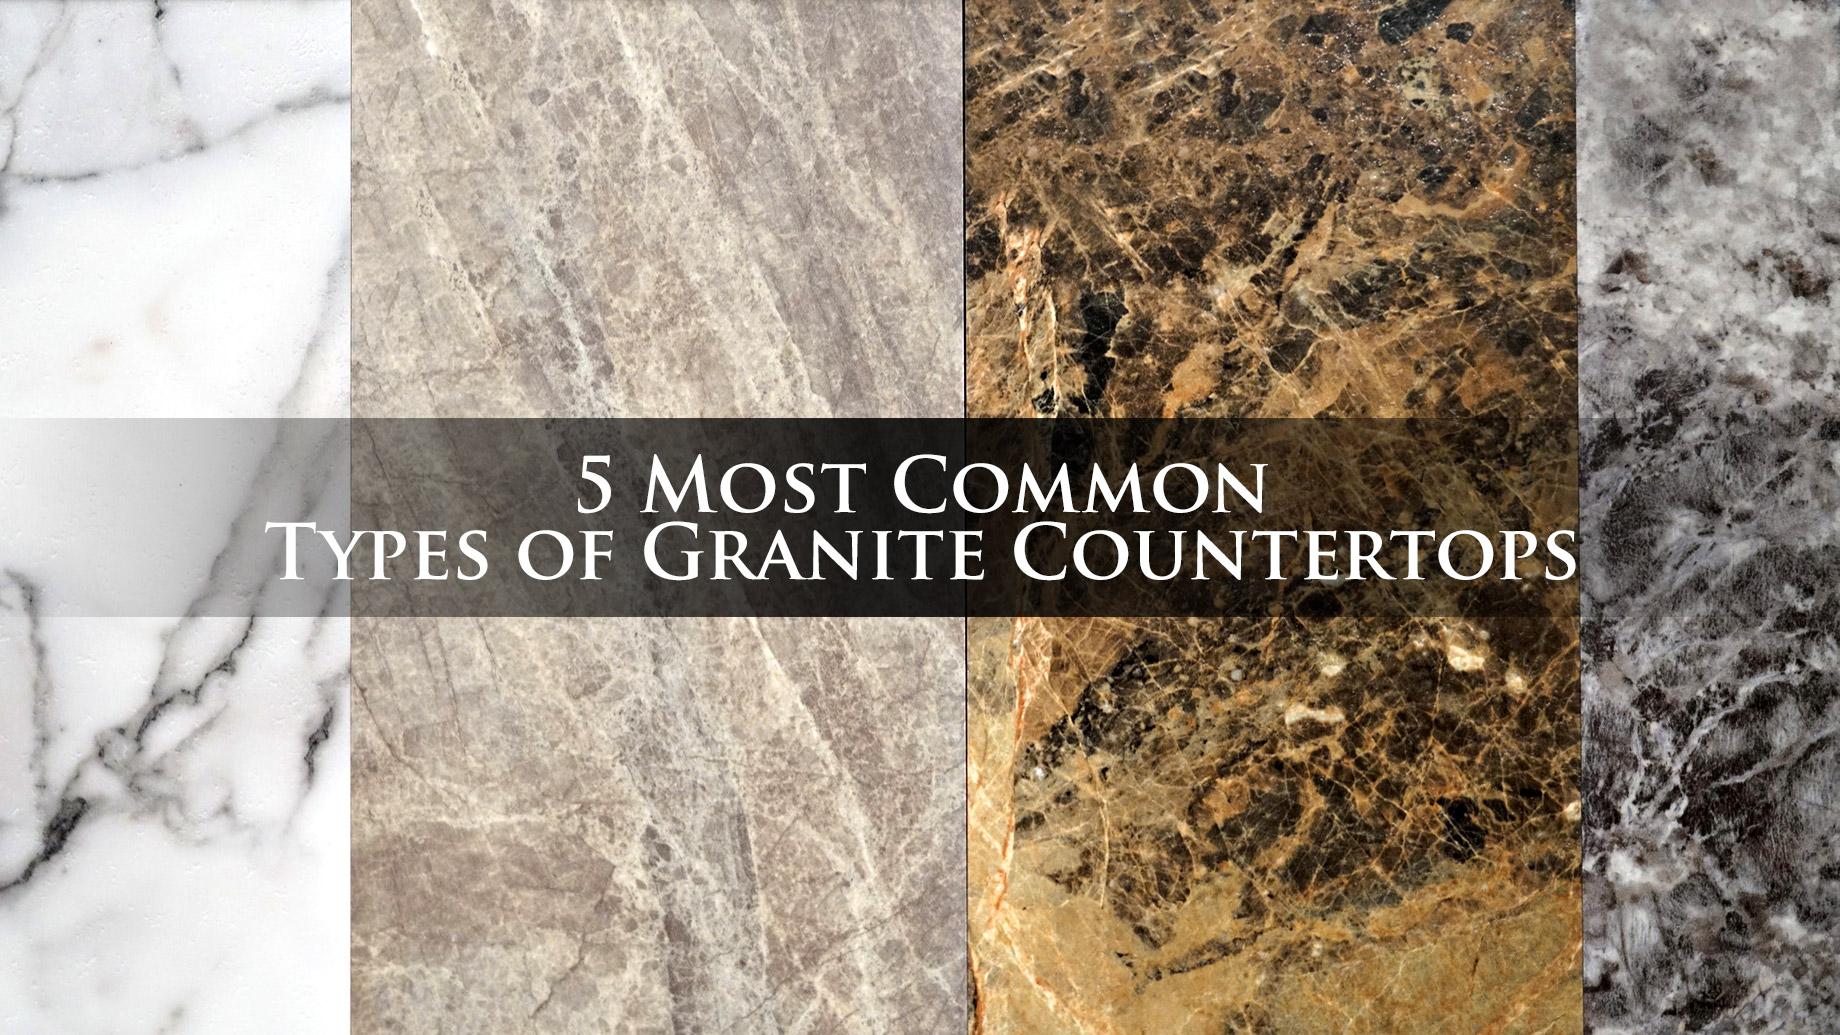 5 Most Common Types of Granite Countertops